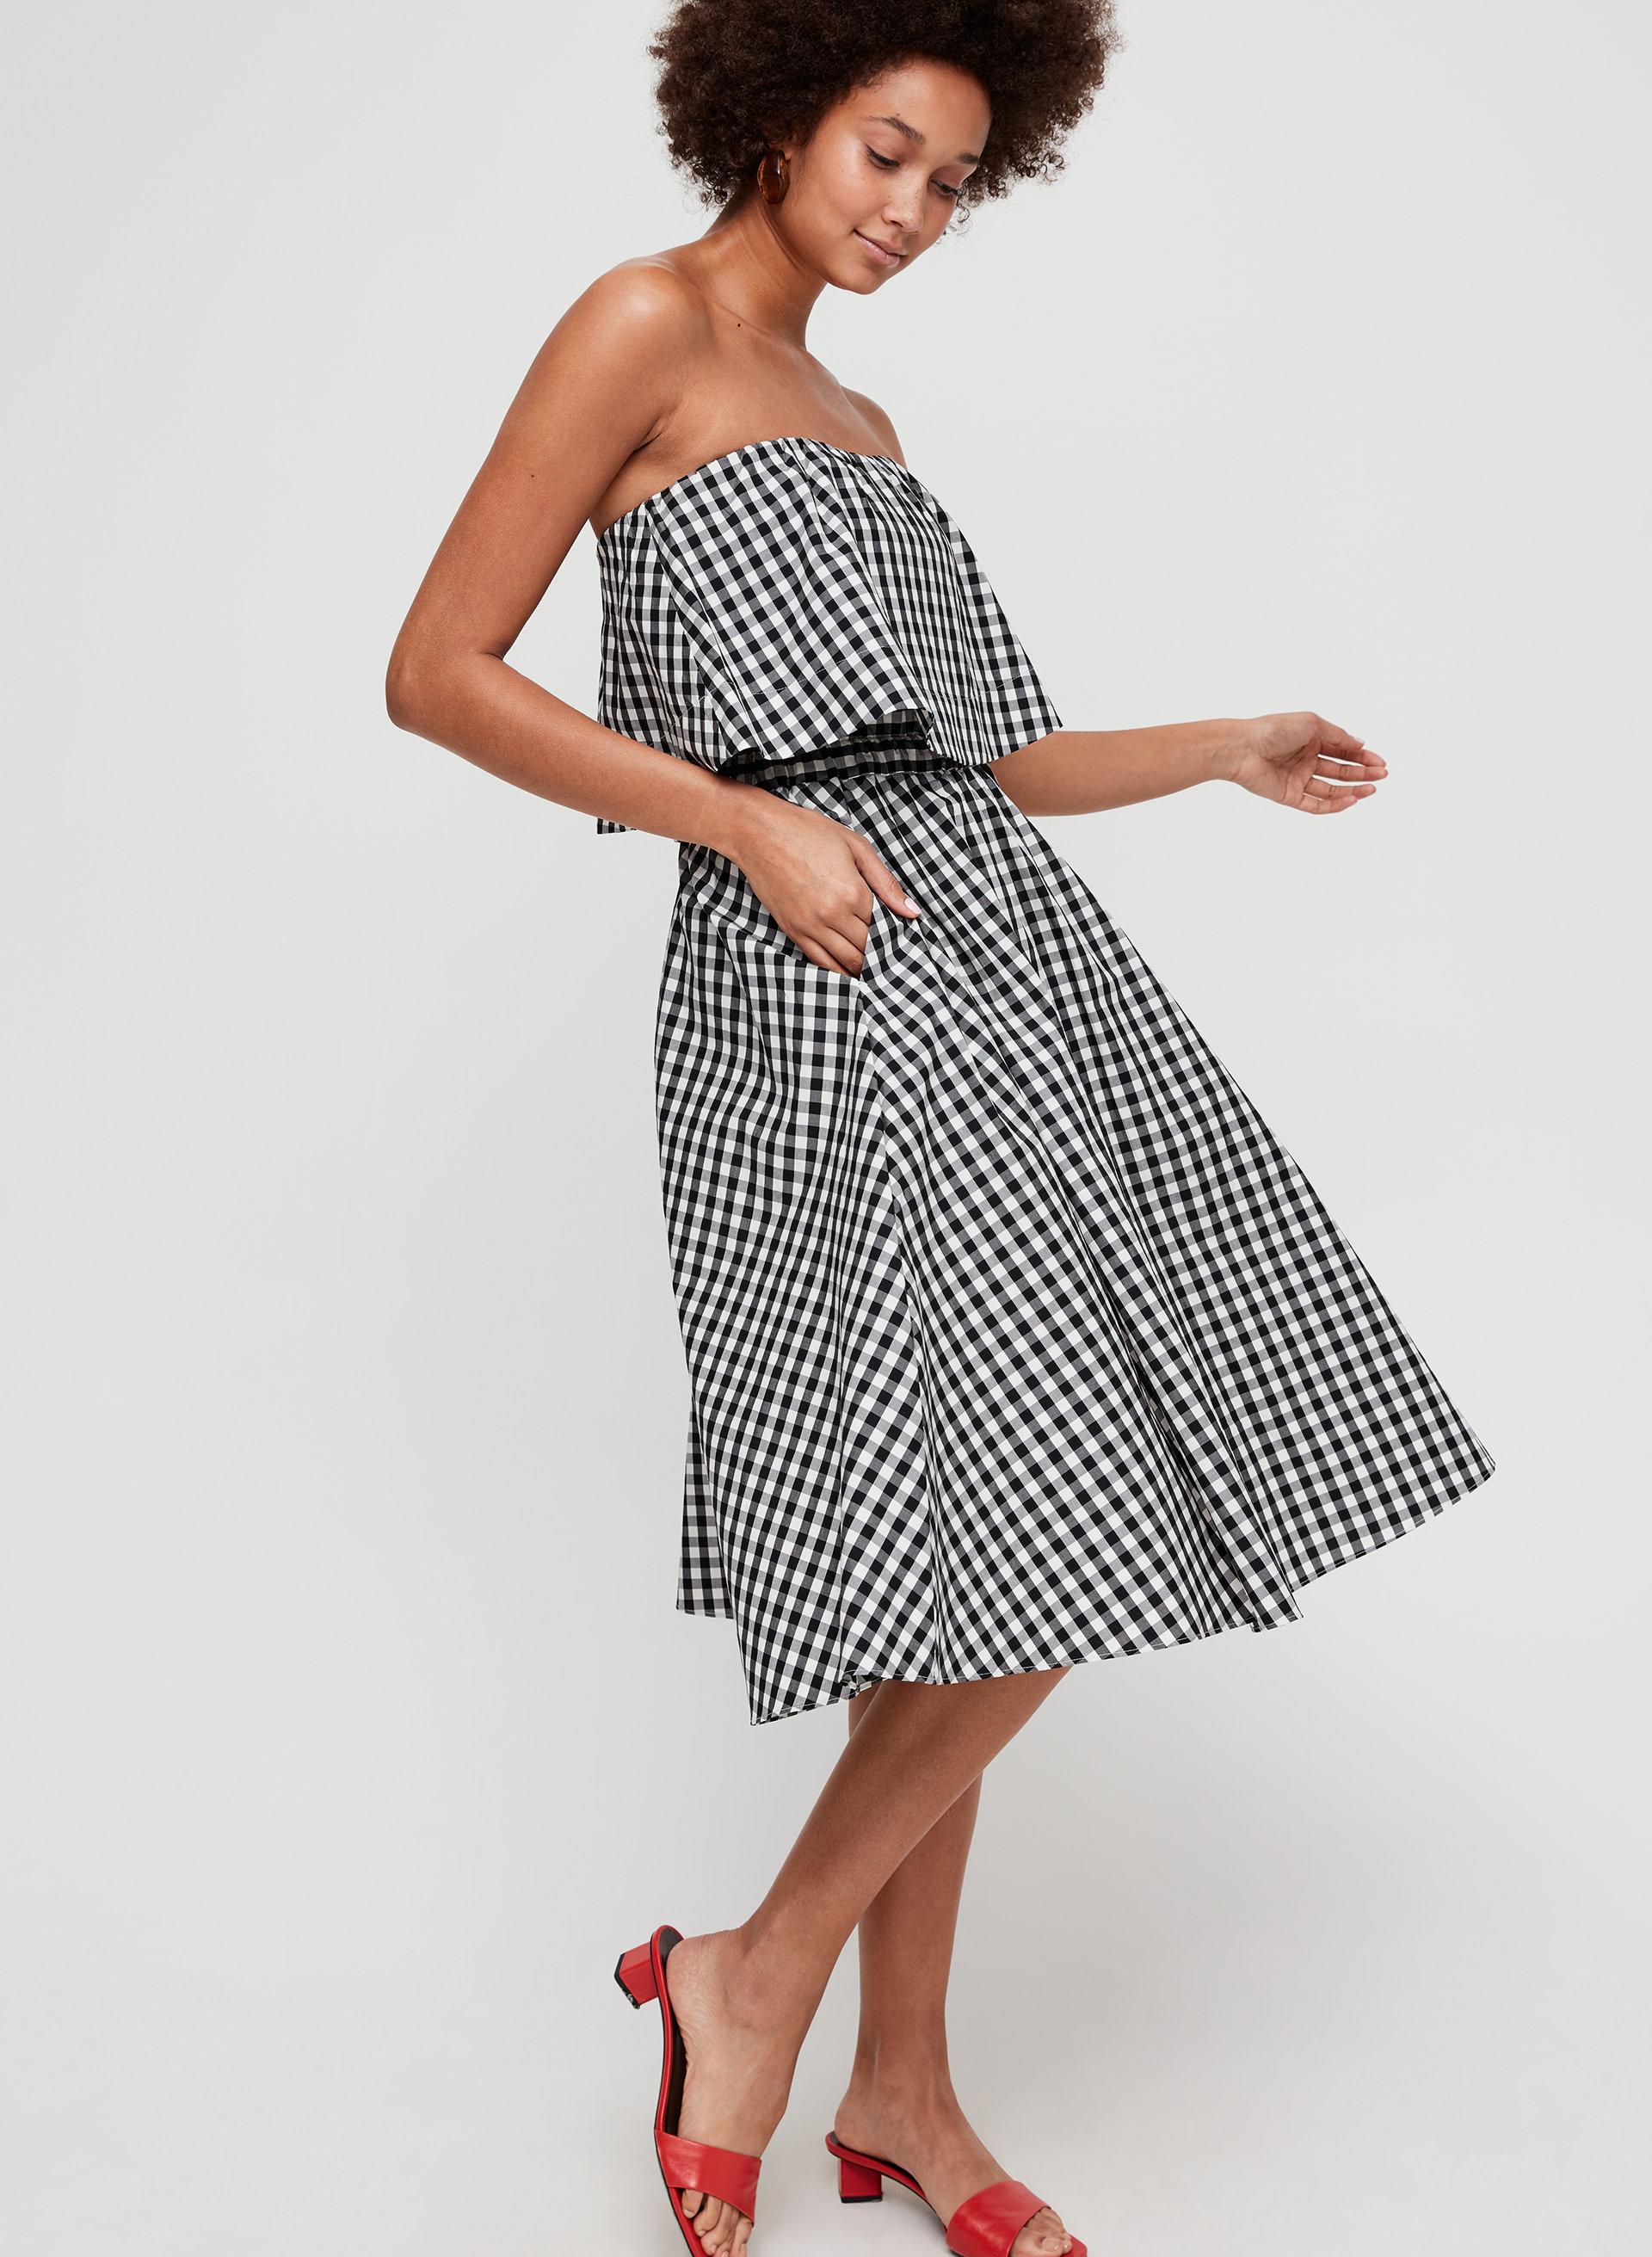 bf2d6cfea0 chambly skirt A-Line, Gingham Midi Skirt